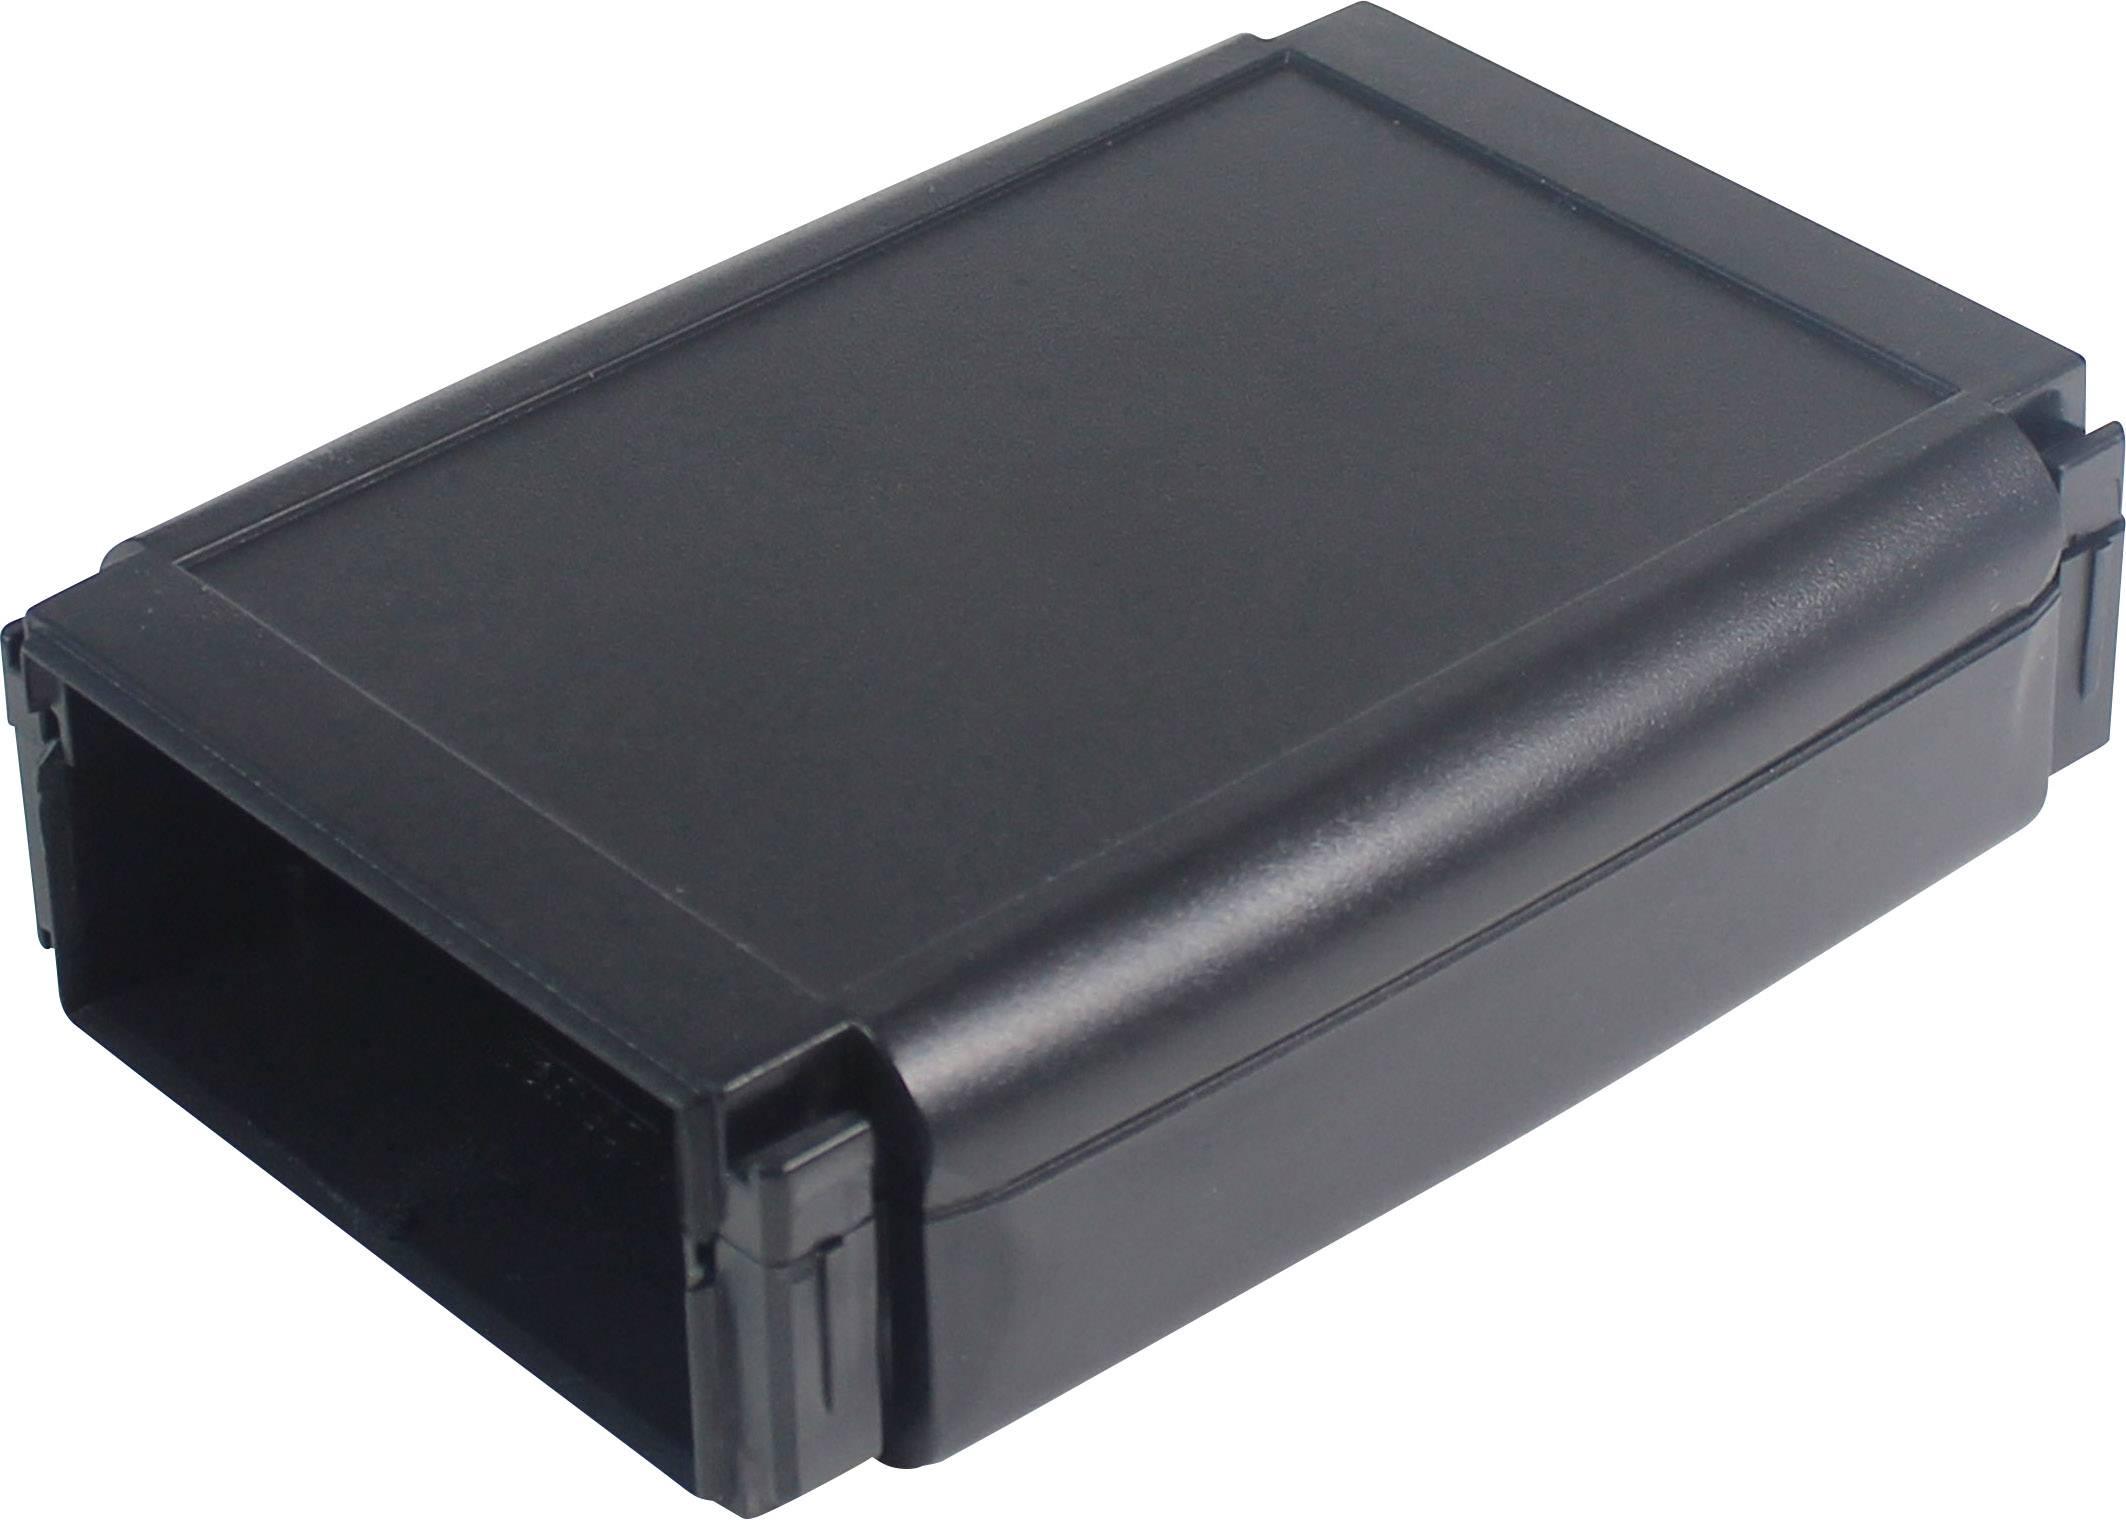 Plastová krabička Axxatronic CHH641NBK, 100 x 80 x 20 mm, ABS, černá, 1 ks